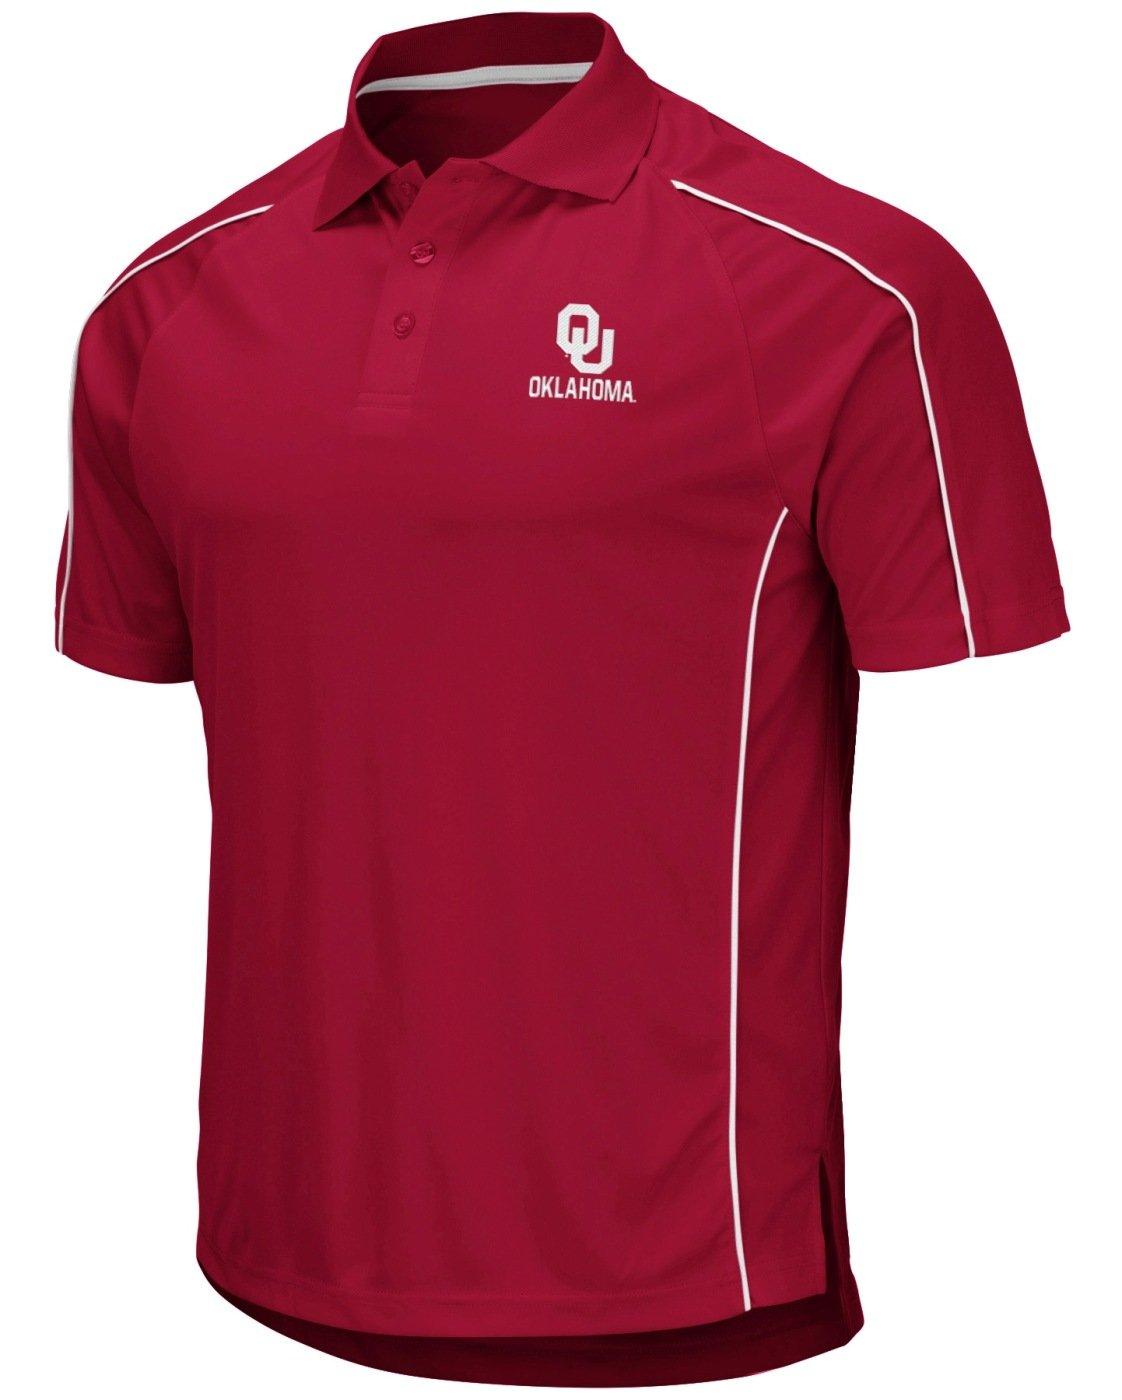 Stadium Athletics Oklahoma Sooners NCAA Bunker Mens Performance Polo Shirt